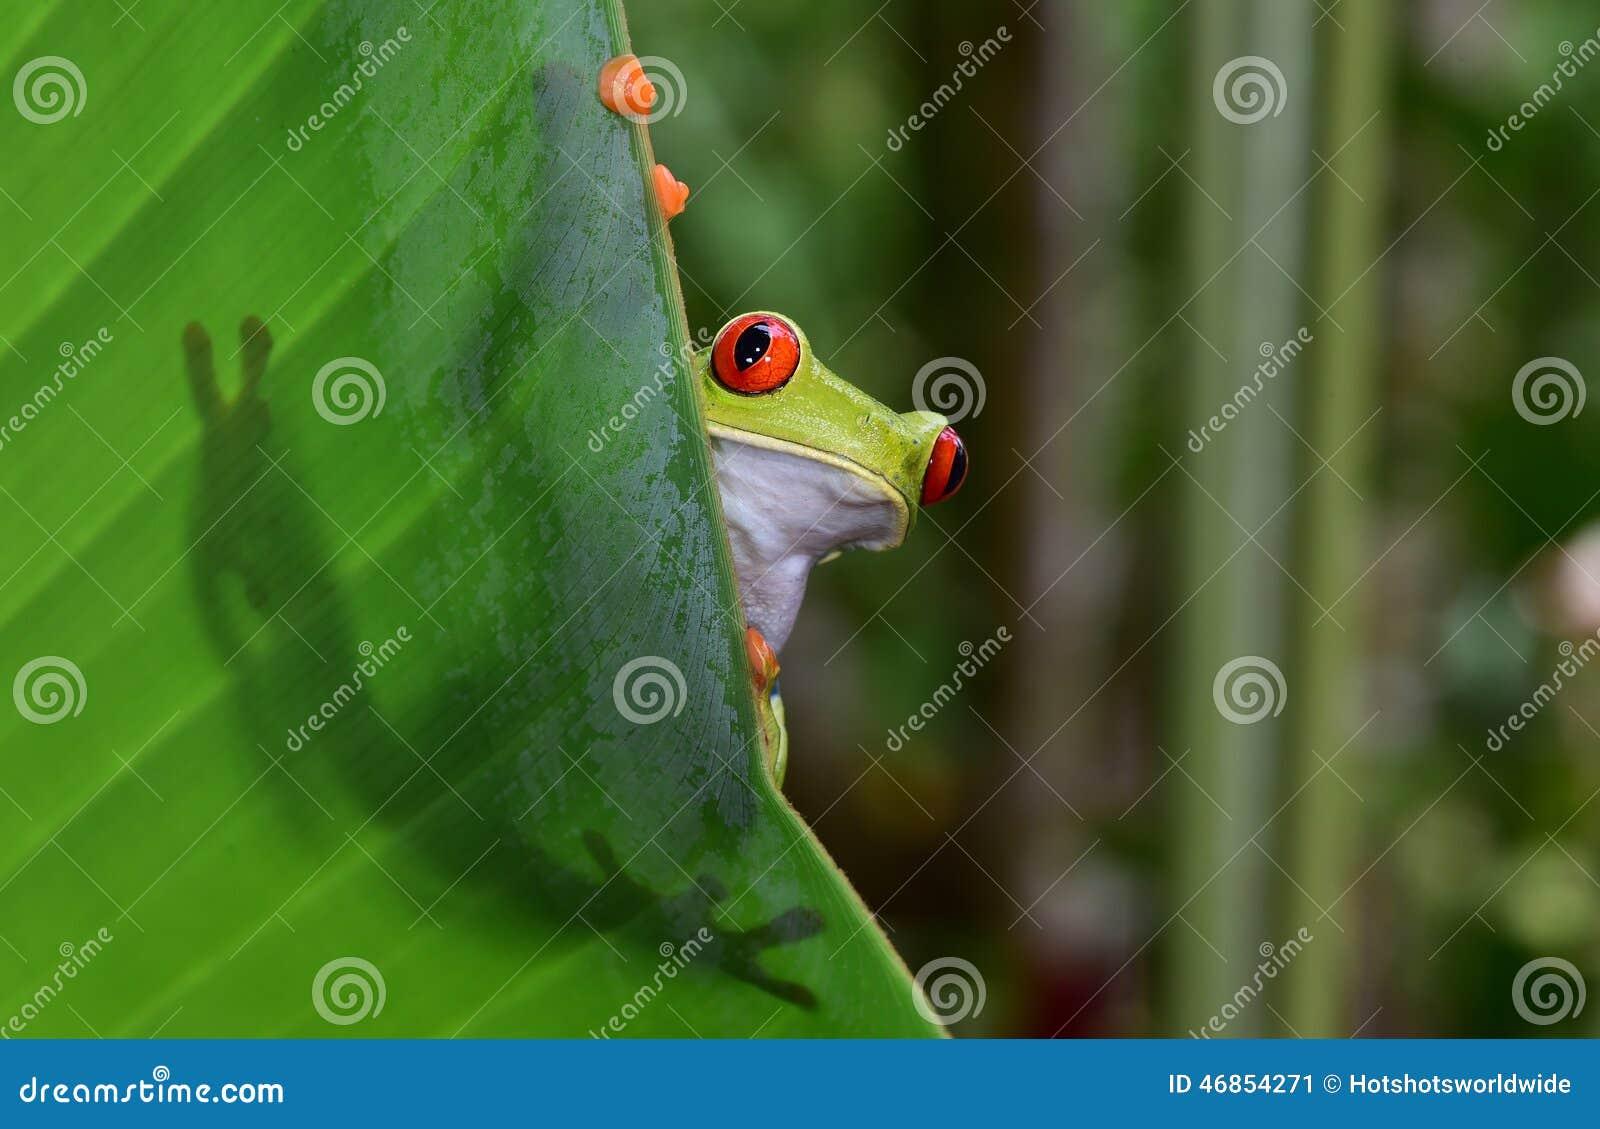 红眼睛的绿色雨蛙, corcovado,哥斯达黎加